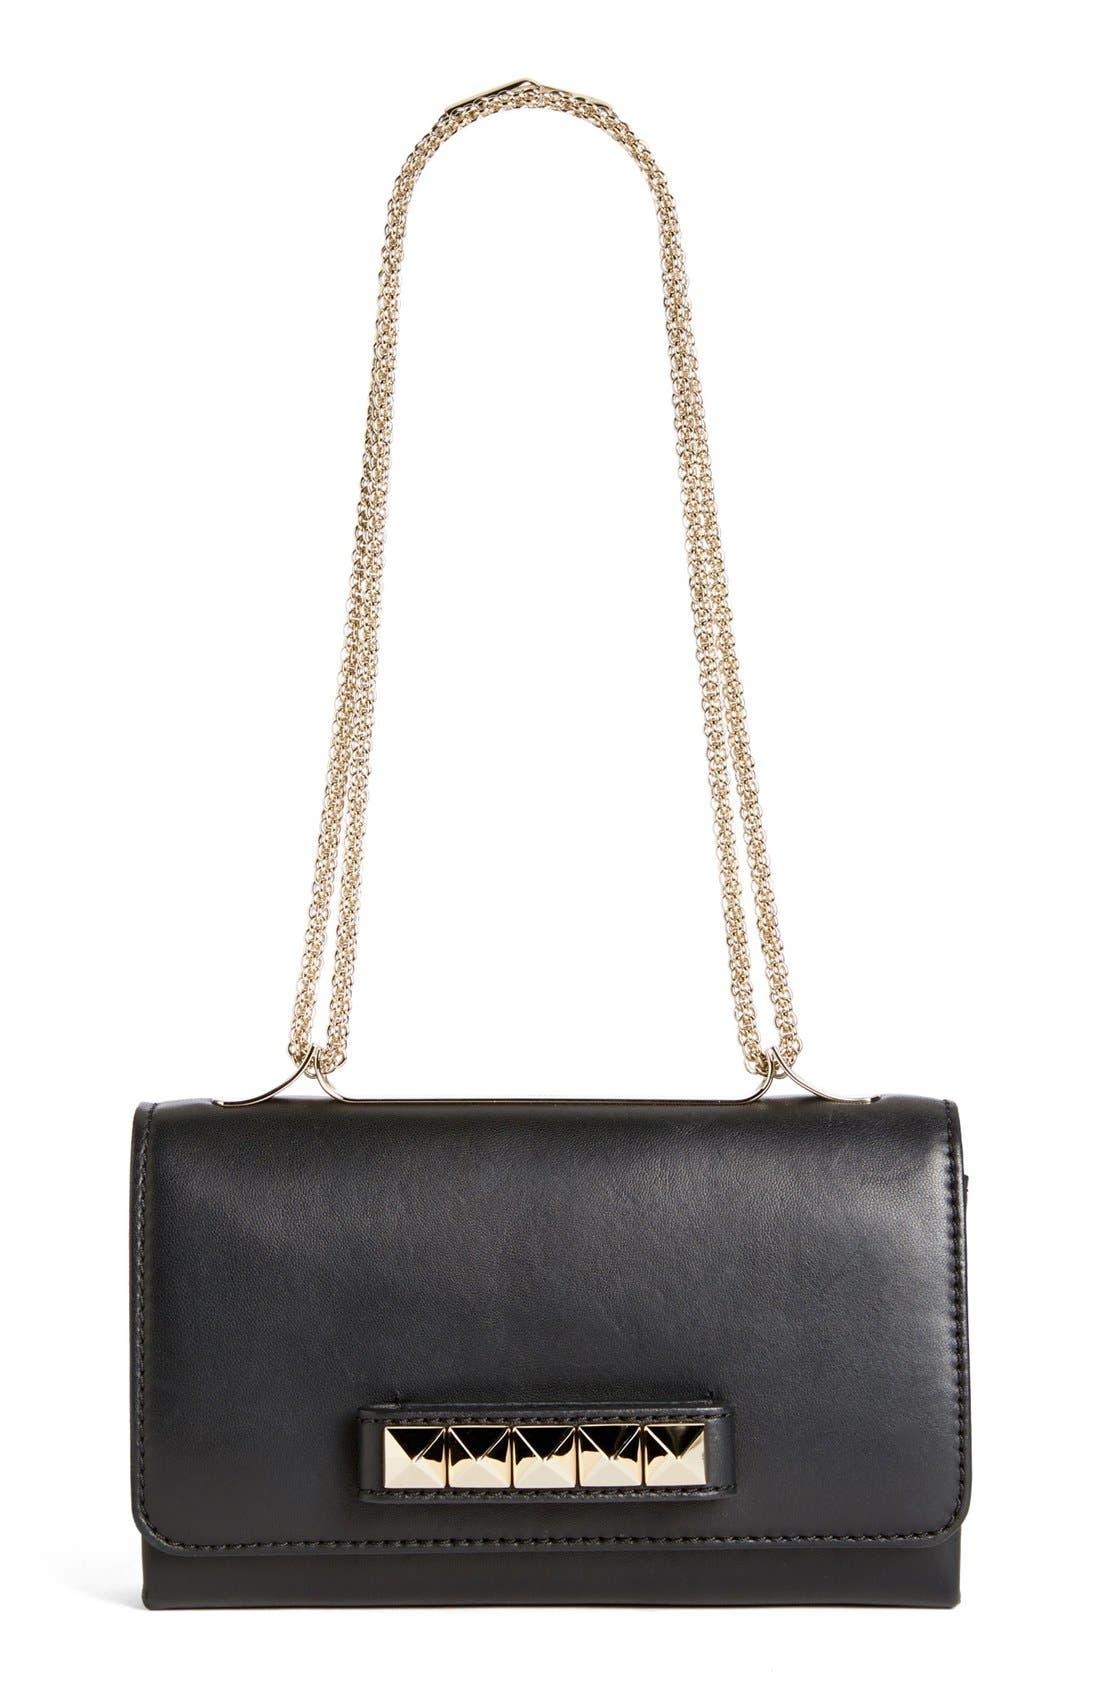 Main Image - Valentino 'Va Va Voom' Nappa Leather Shoulder Bag